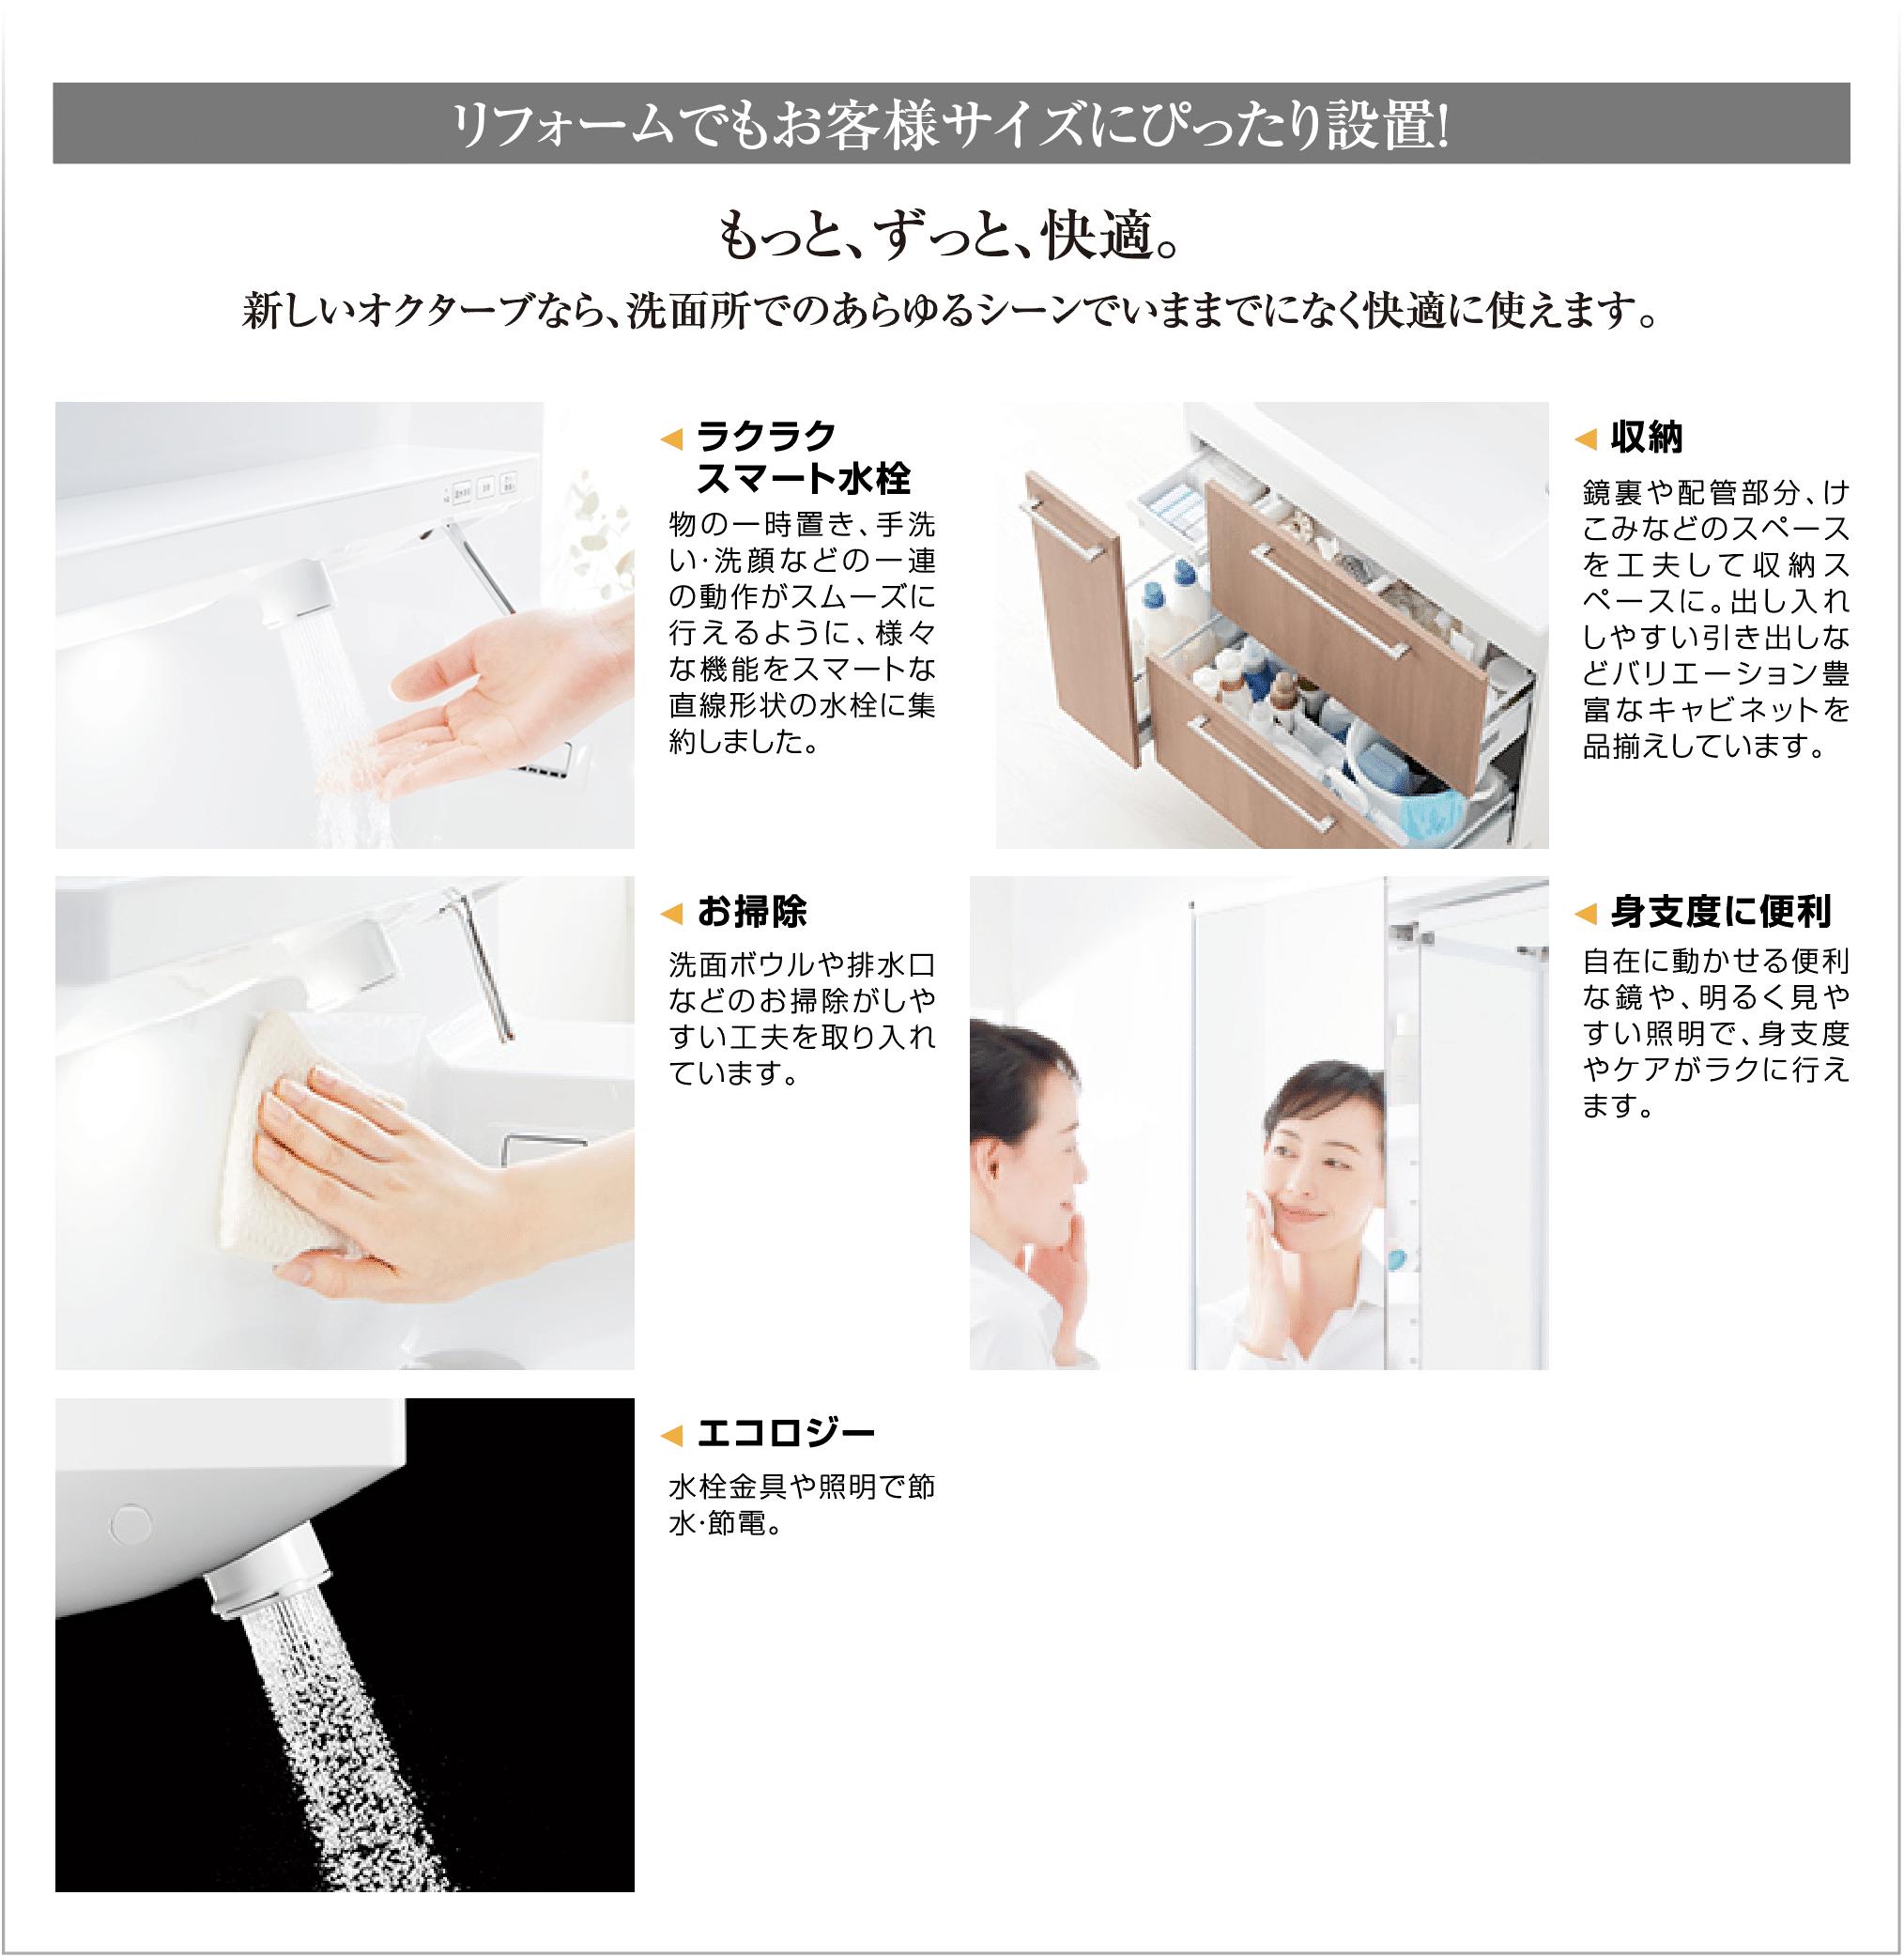 TOTO洗面化粧台Octaveはずっと快適。ラクラクスマート水栓など。